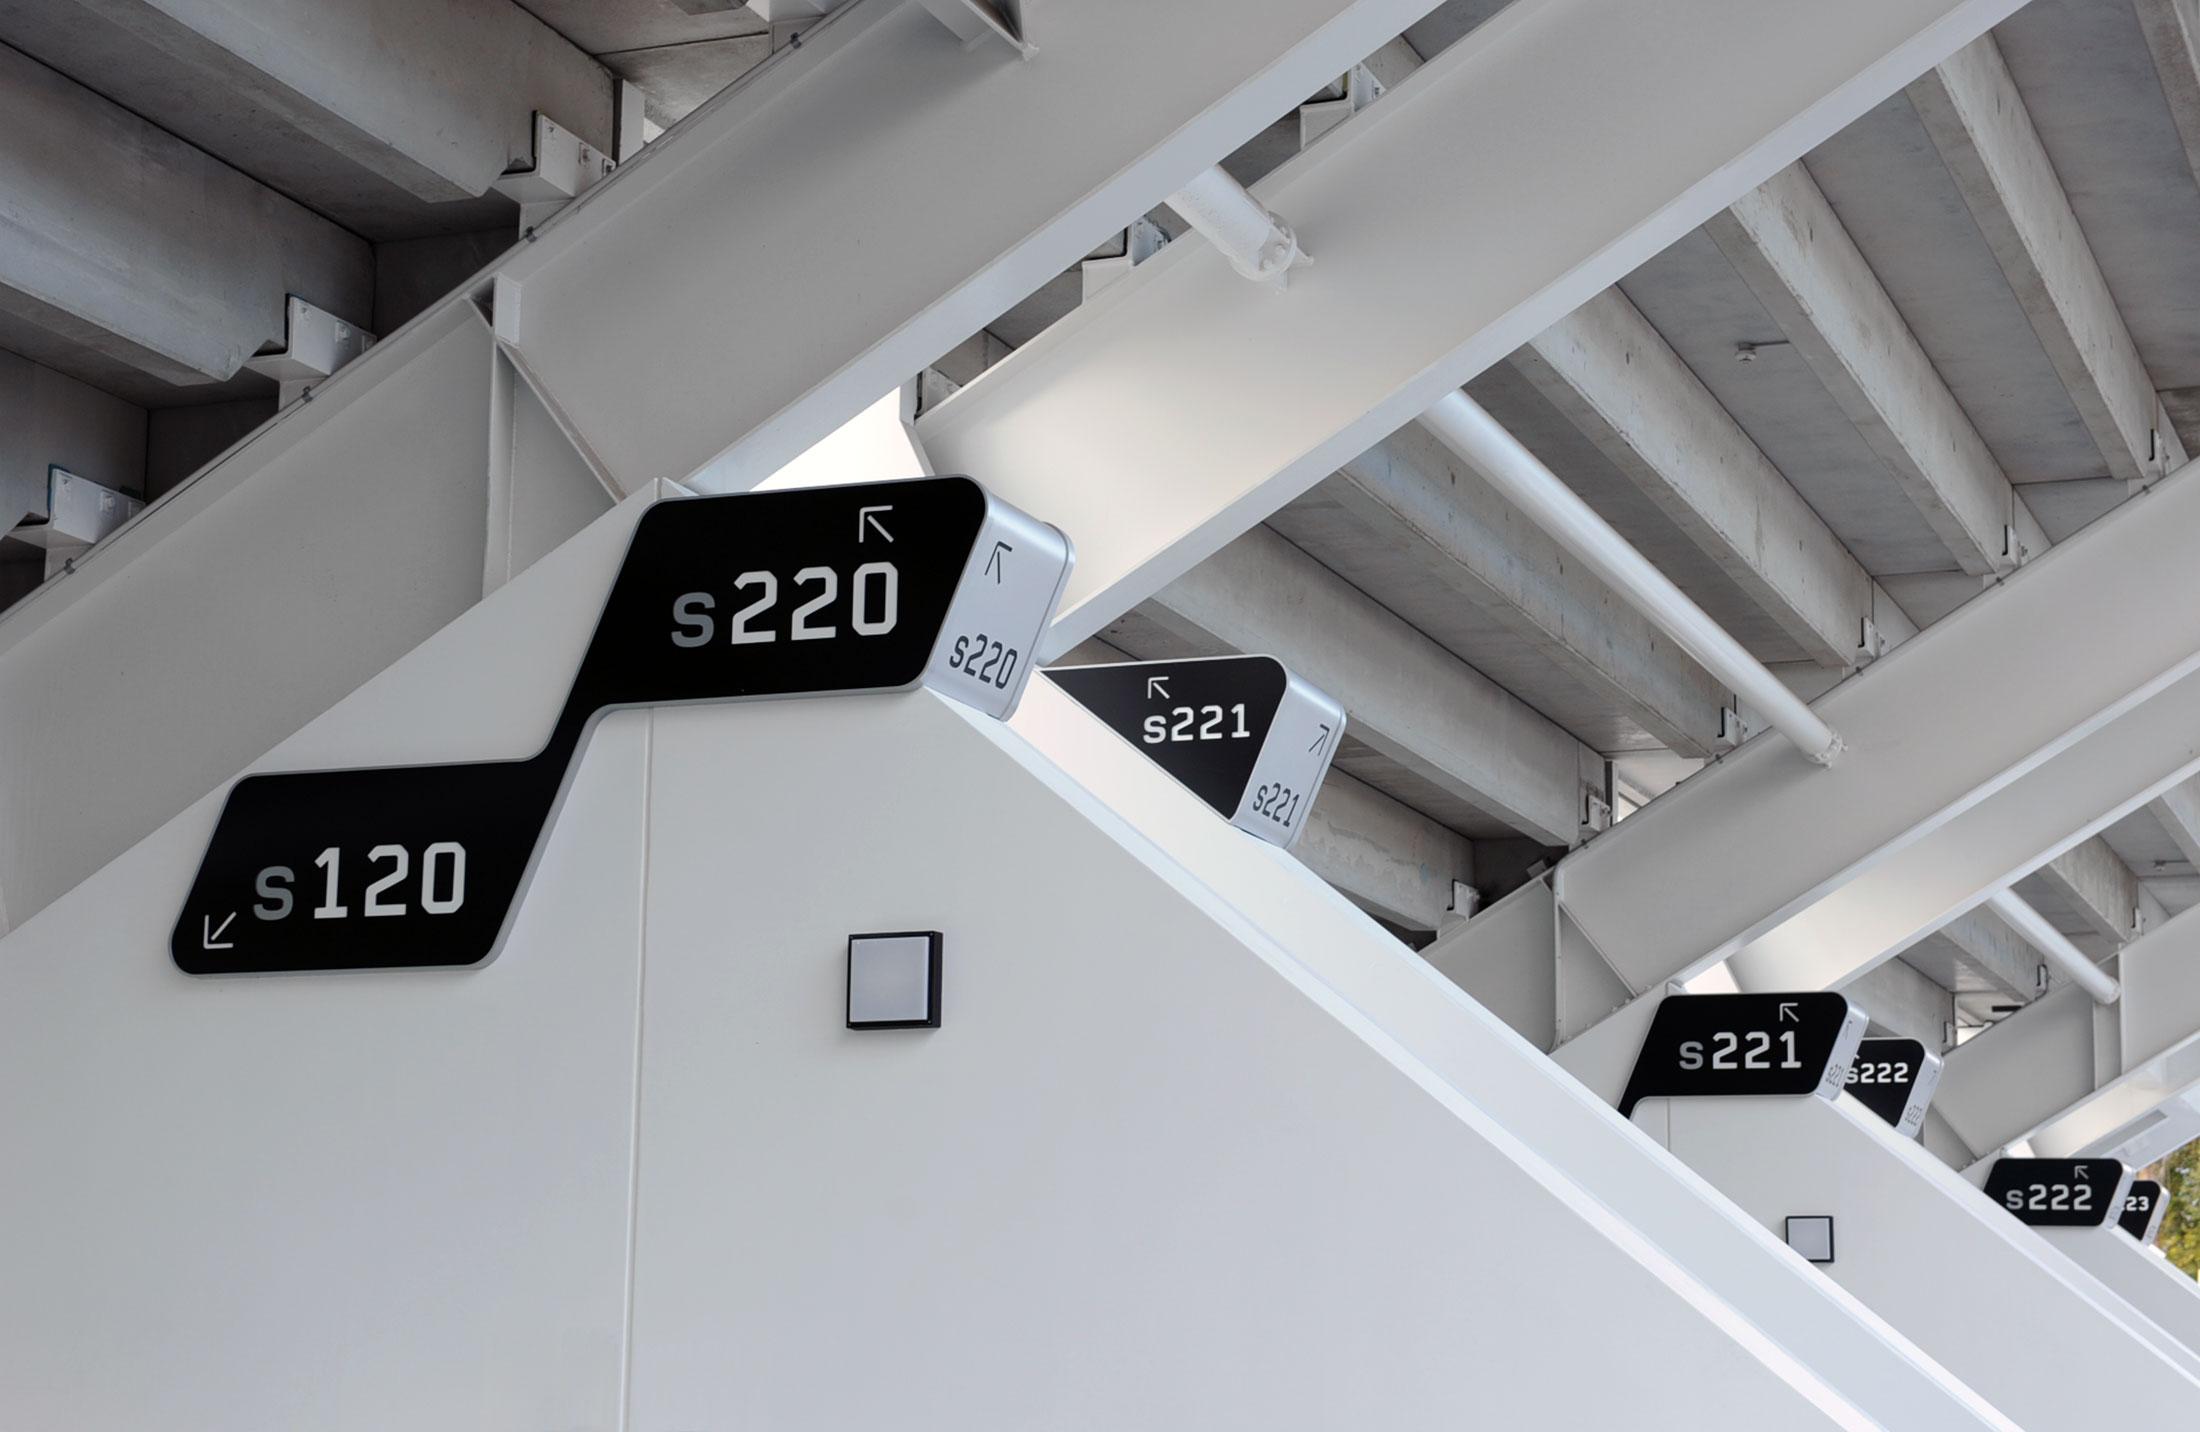 Perth Rectangular Stadium – Wayfinding Signage